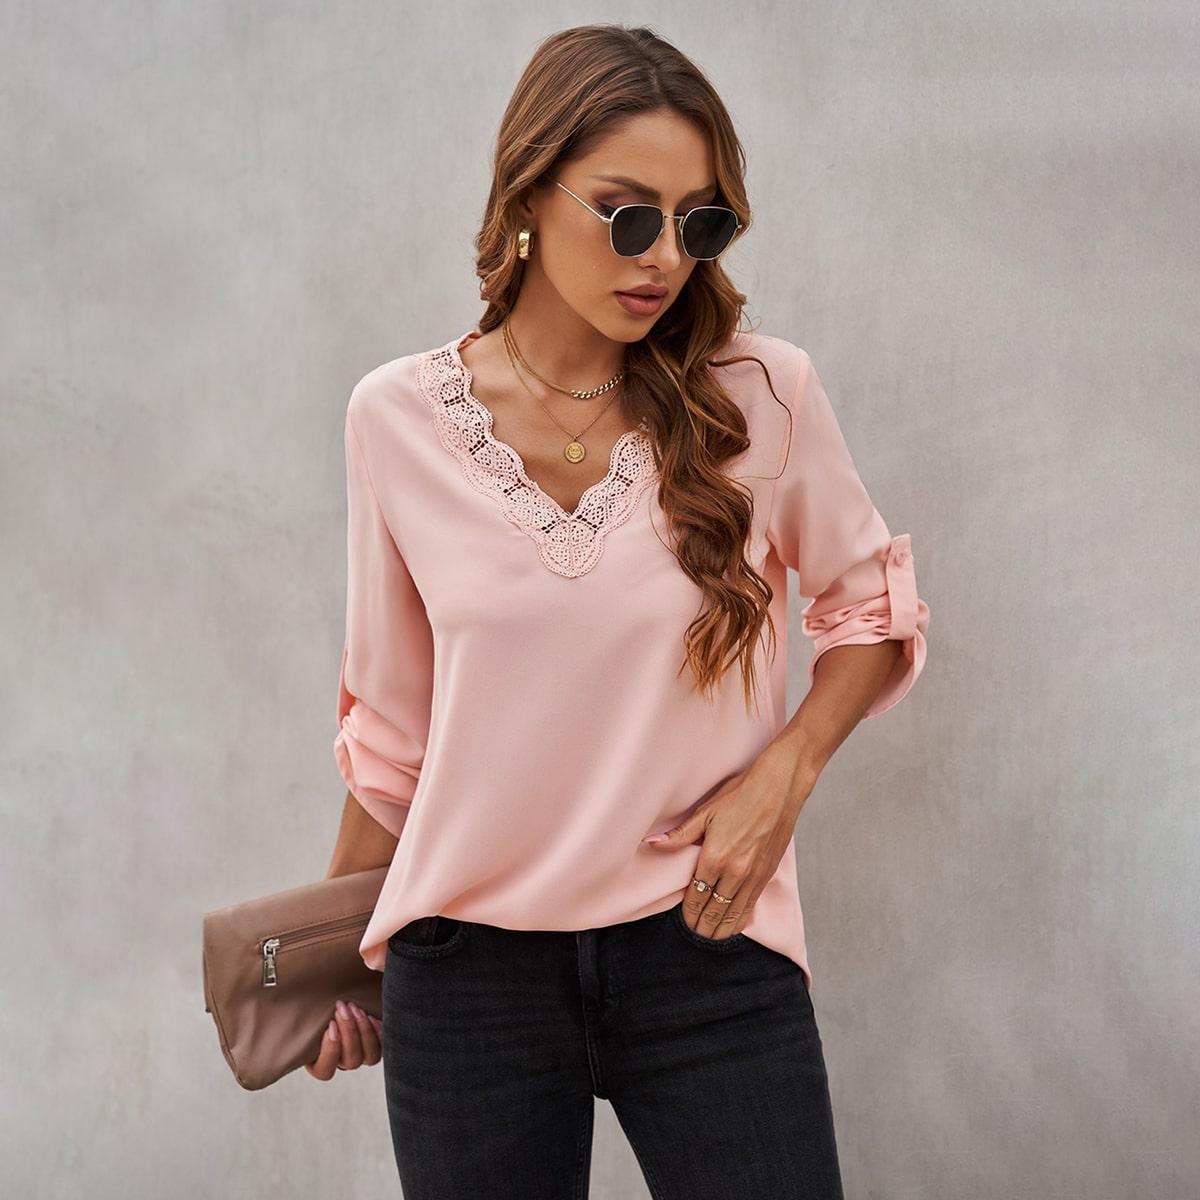 Блуза с кружевом SheIn swblouse23210615754